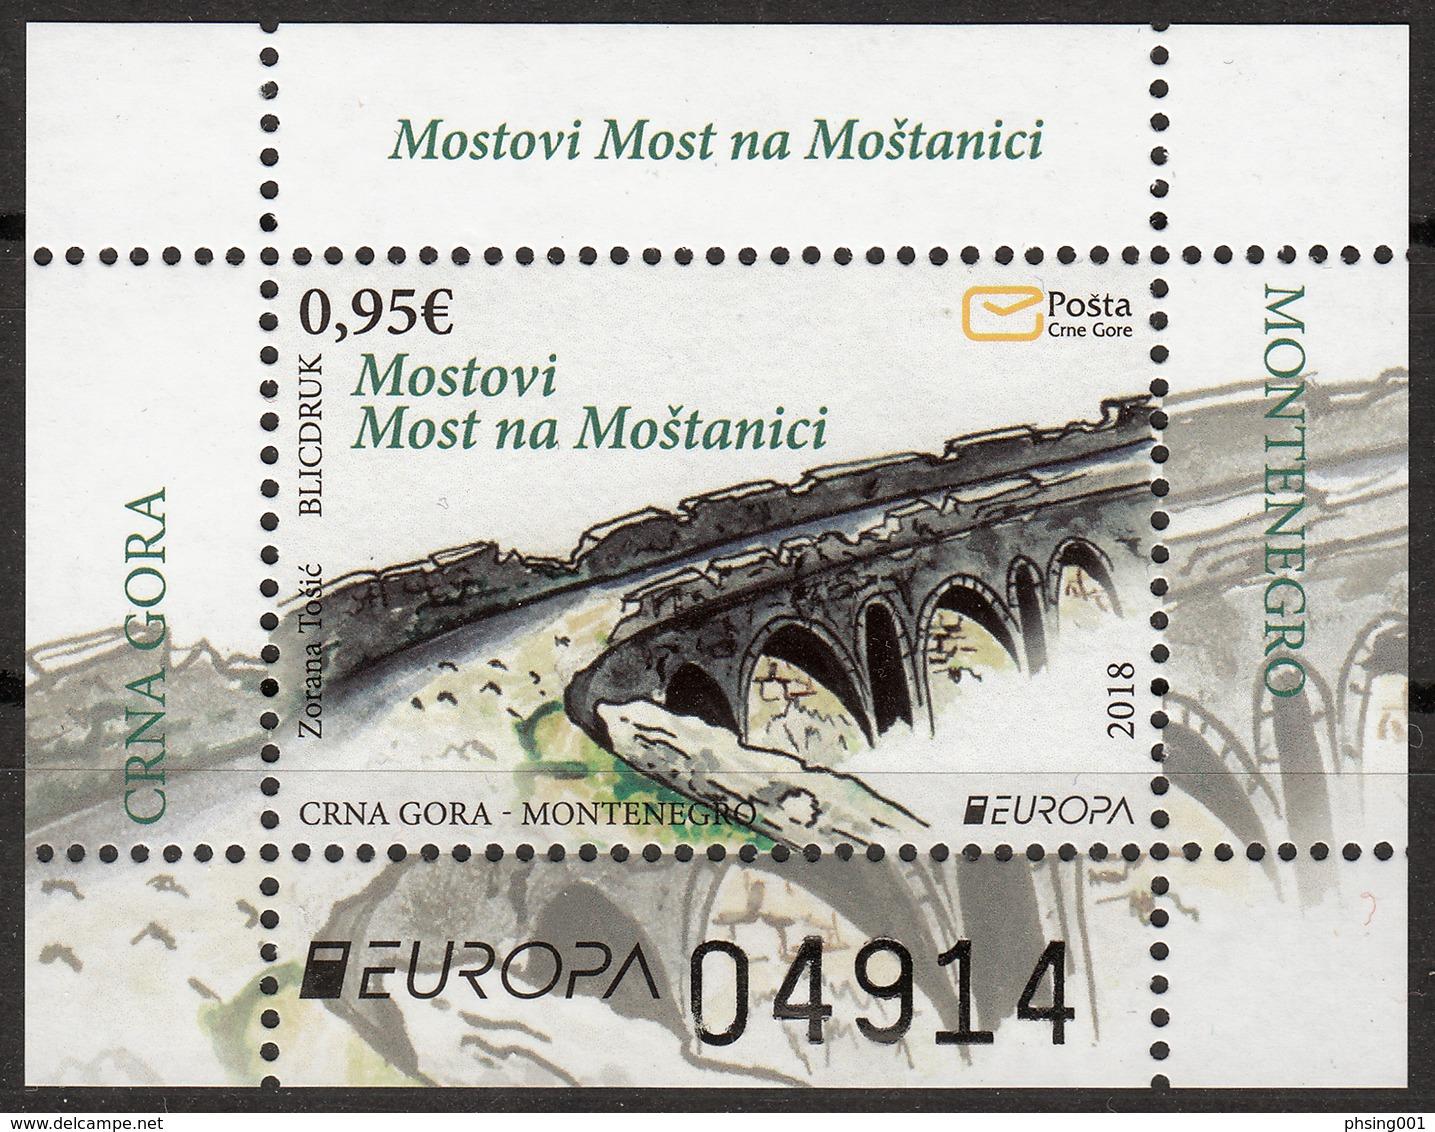 Montenegro 2018 Europa CEPT, Bridges Bruecken Ponts Architecture Block, Souvenir Sheet MNH - 2018